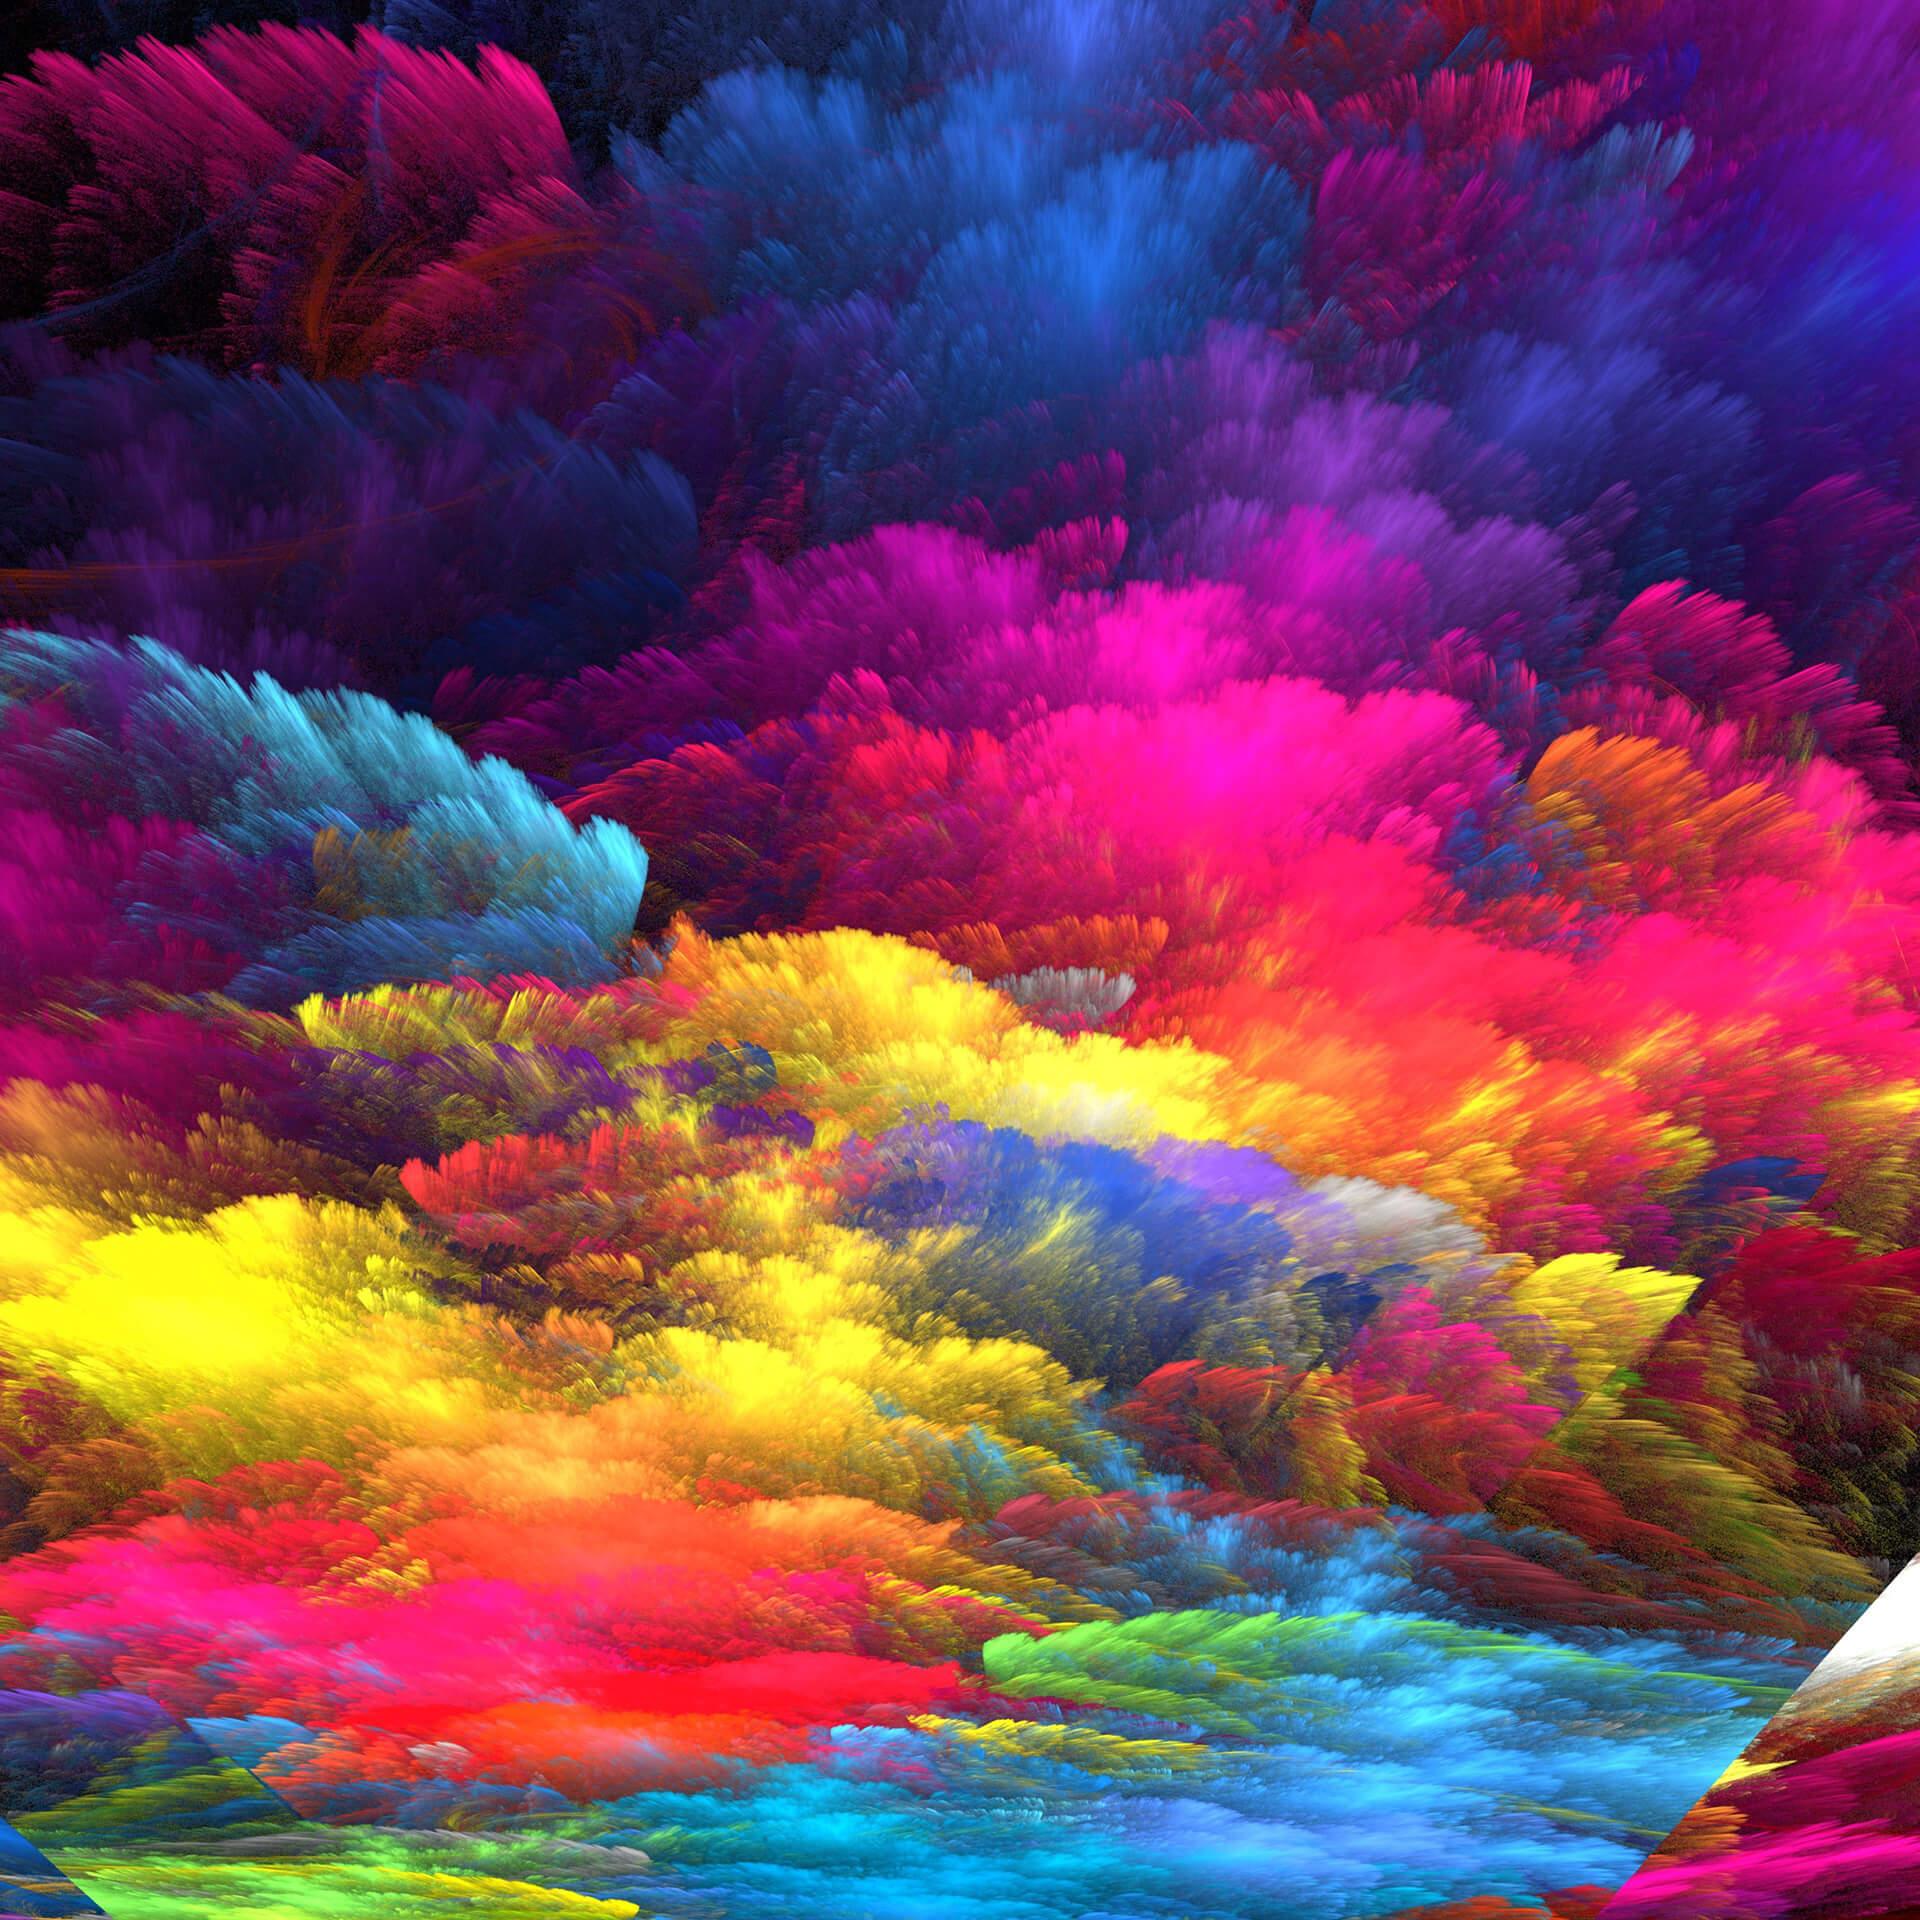 Rete e arcobaleno